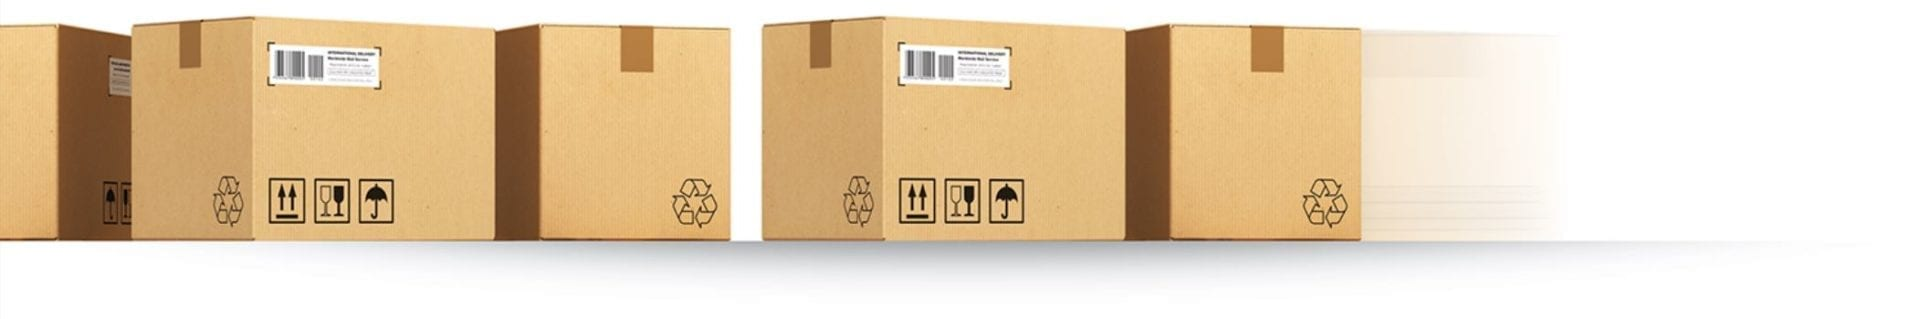 distribution-boxes